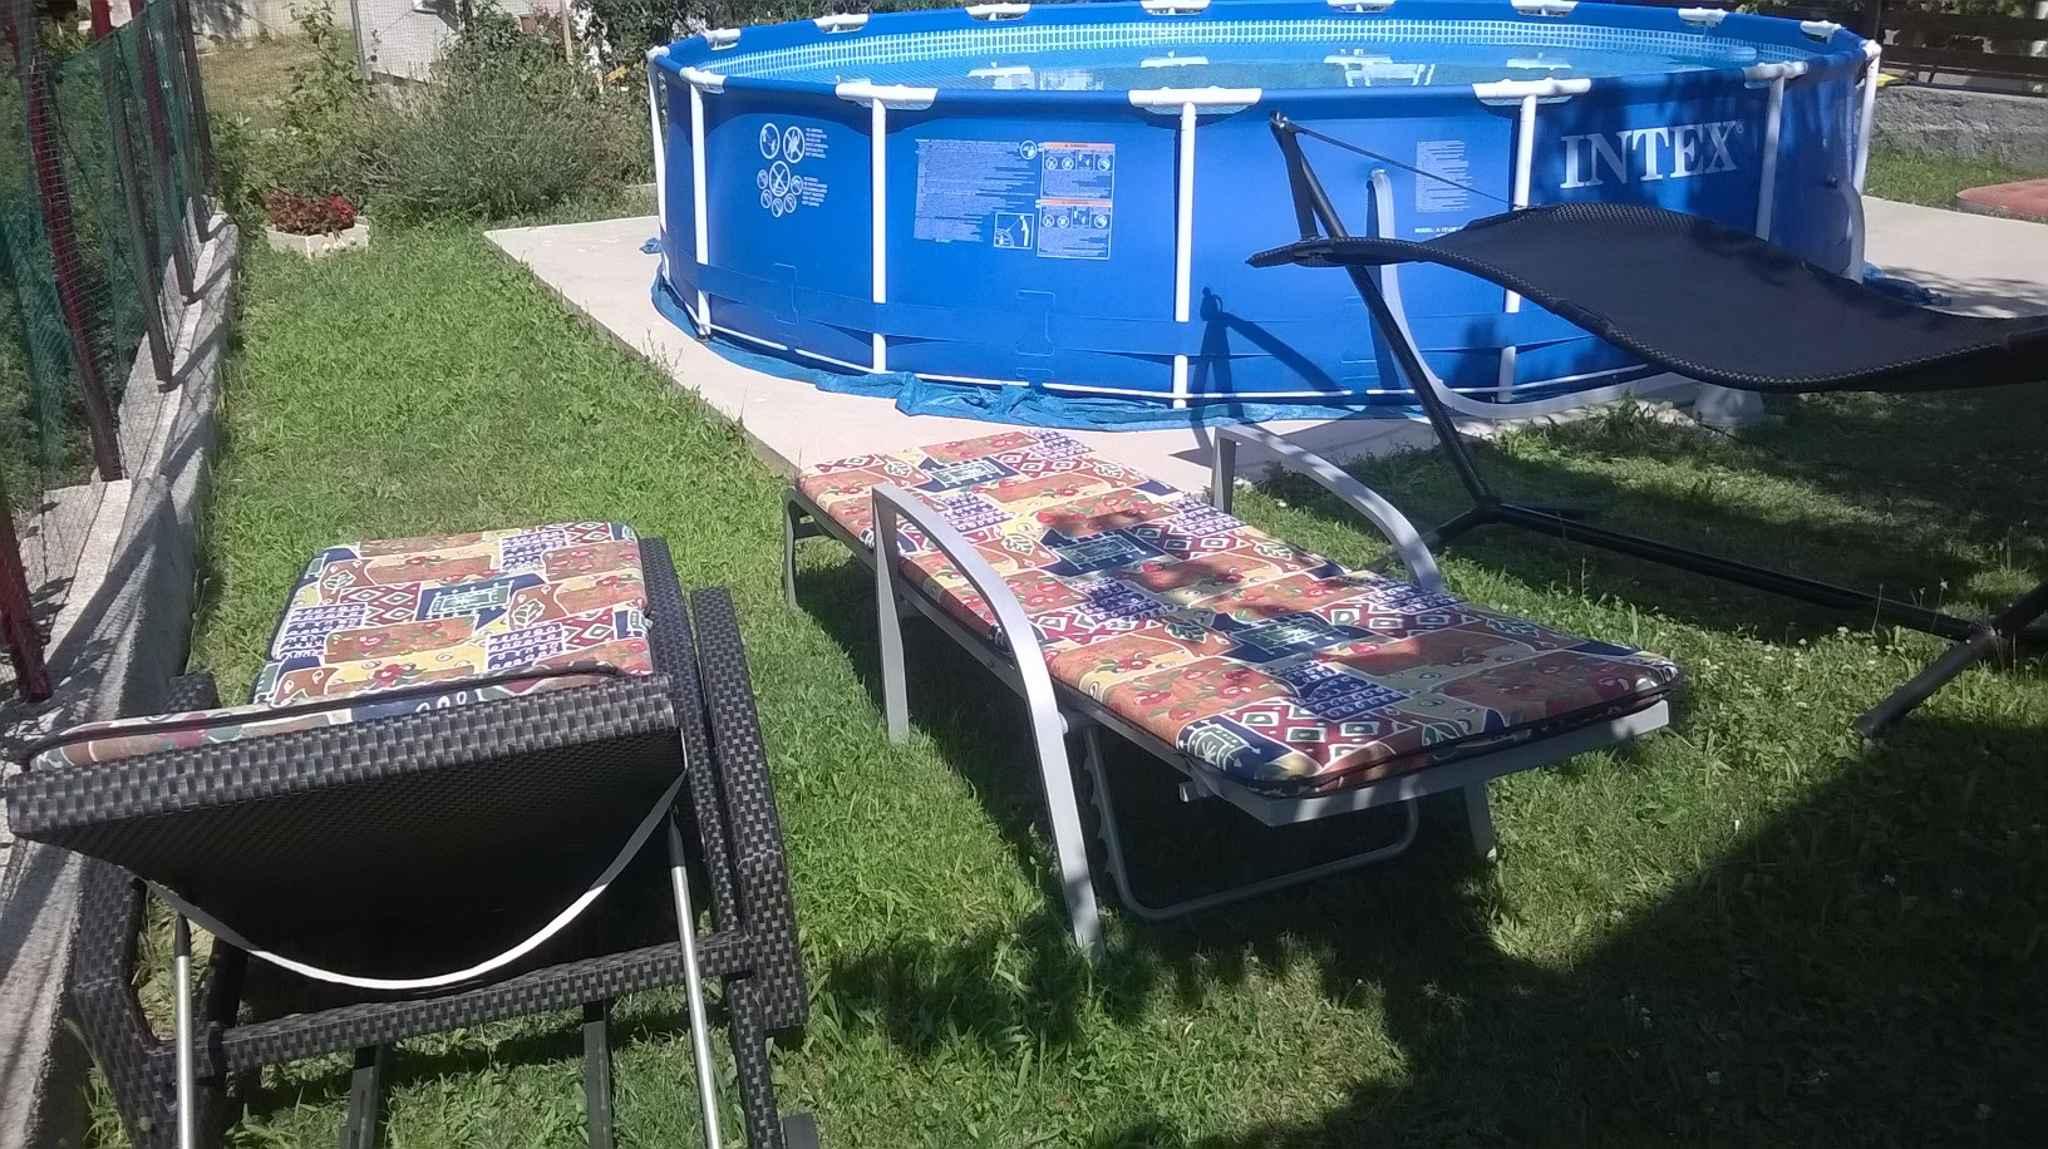 Appartement de vacances s ljetnom kuhinjom i bazenom (648047), Grižane, , Kvarner, Croatie, image 8